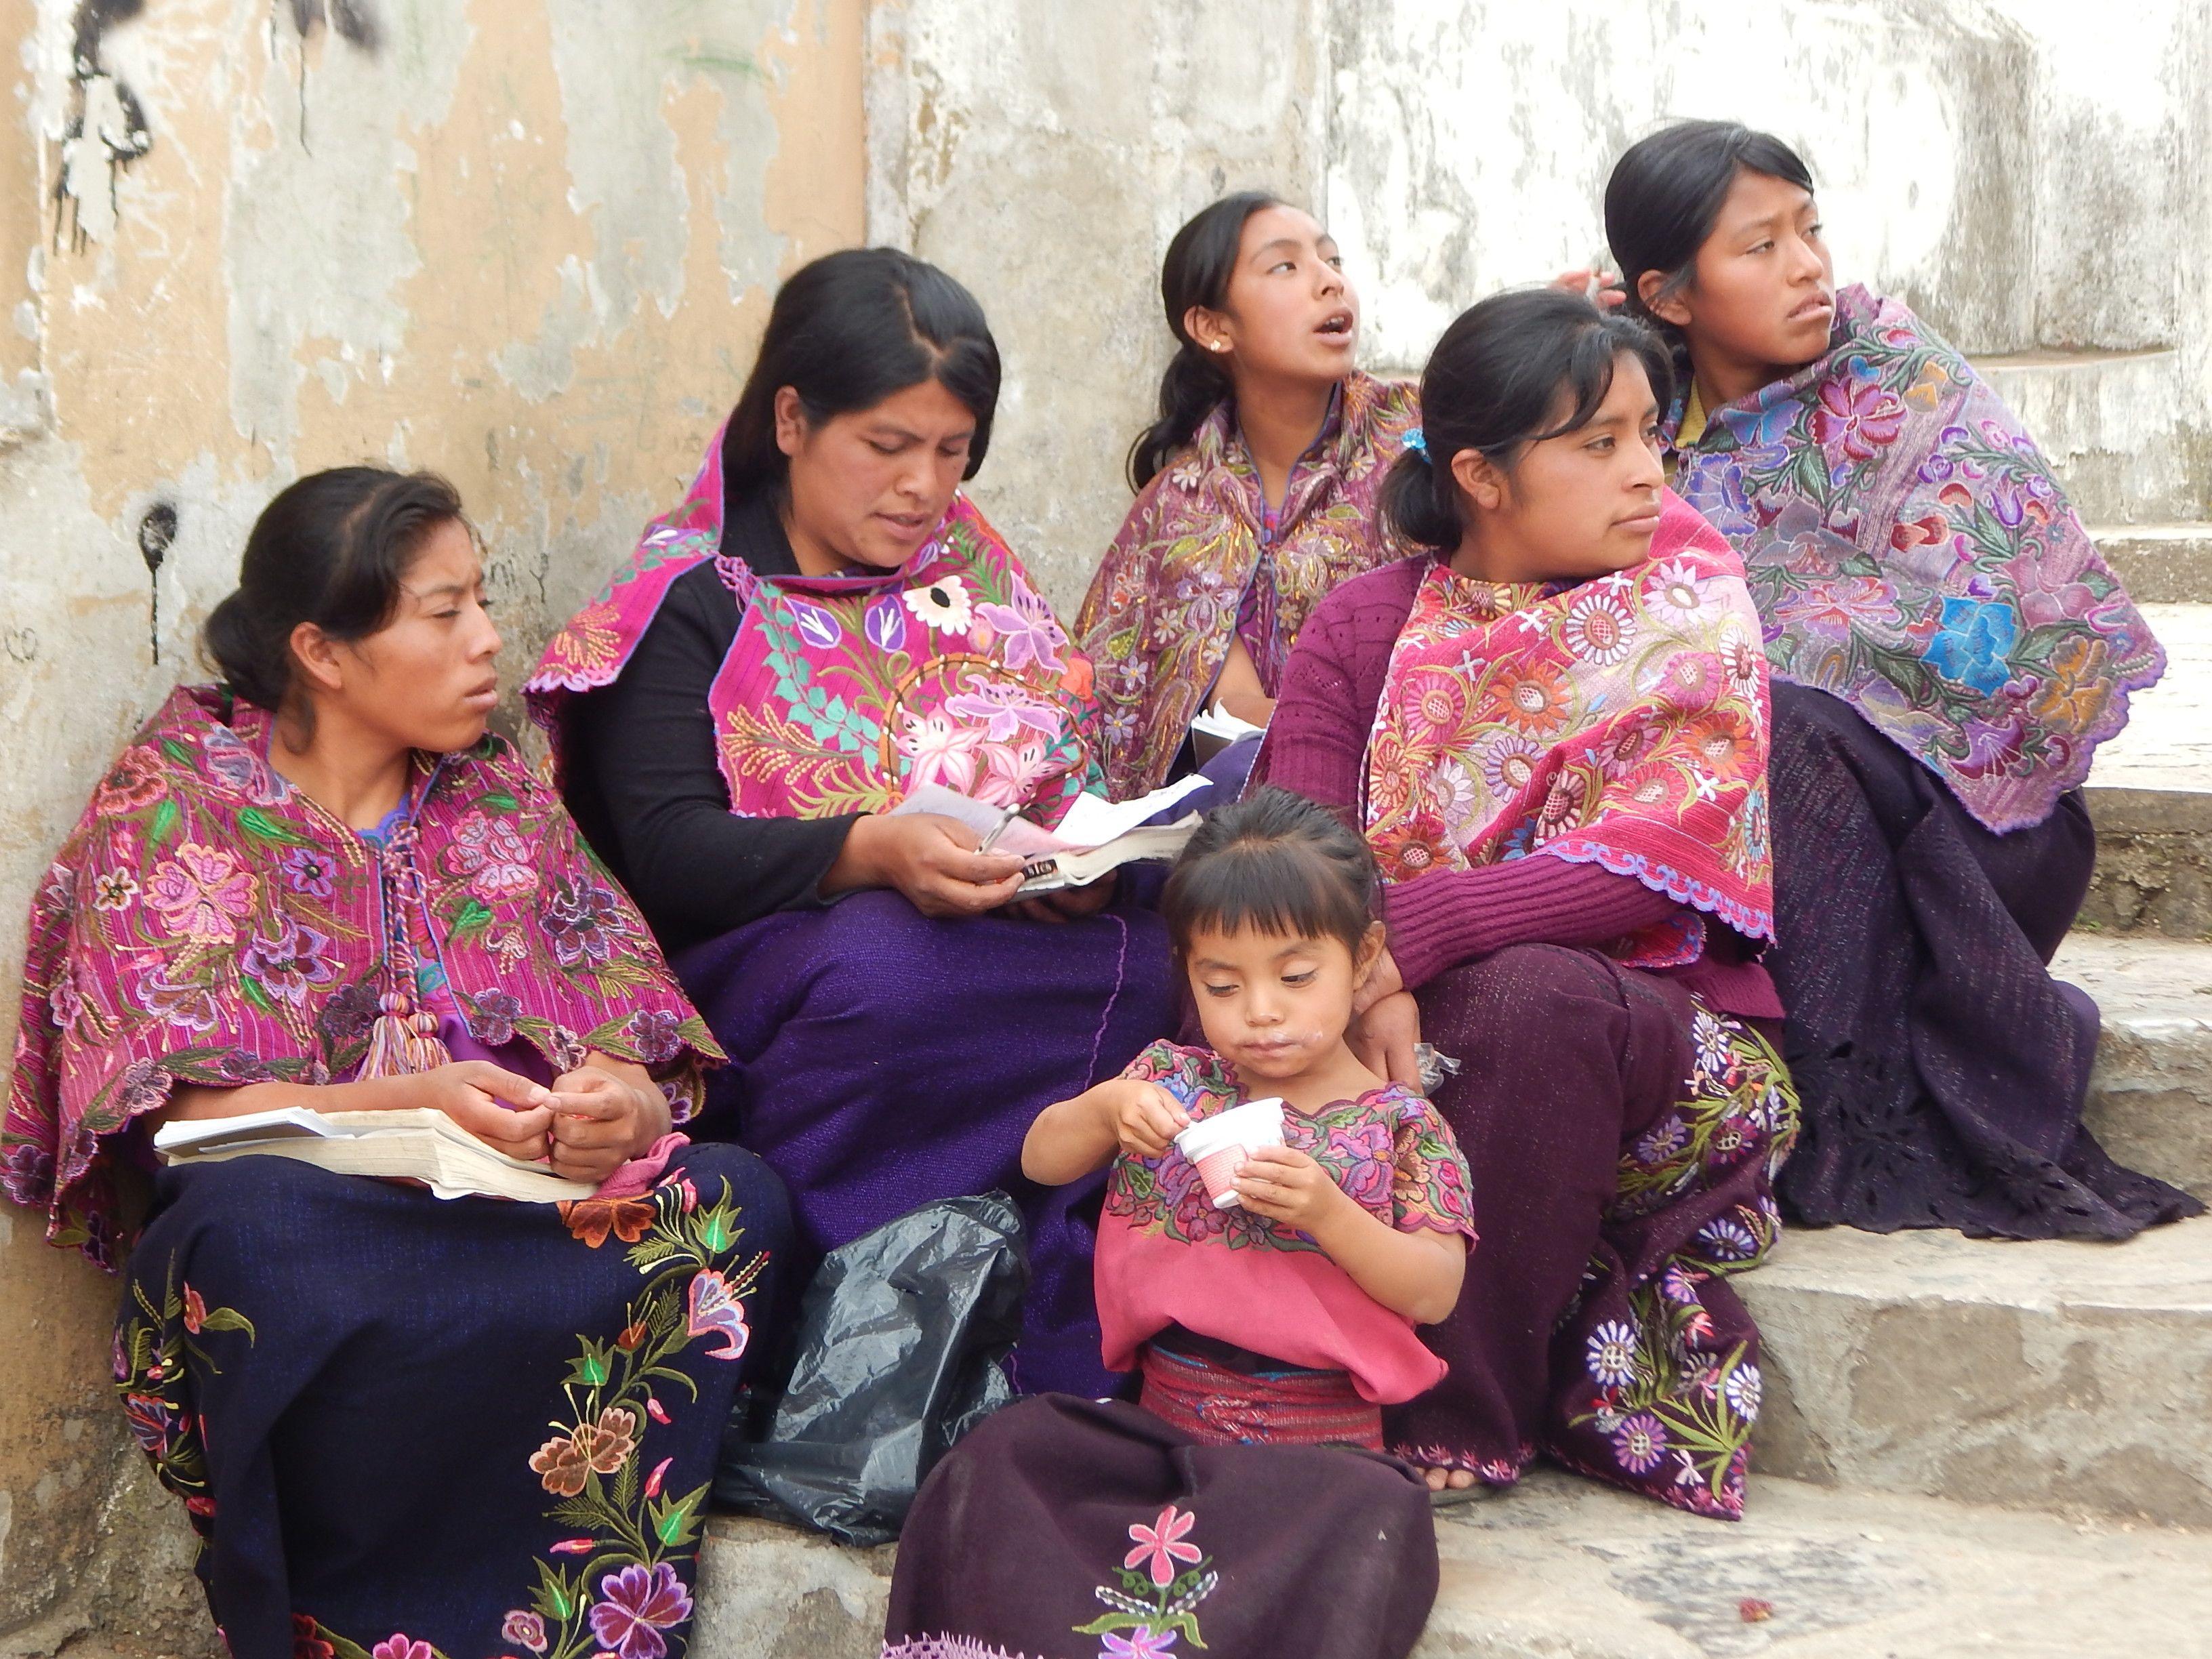 Mayan ladies, Zinacantan, Chiapas Mexico people, Chiapas